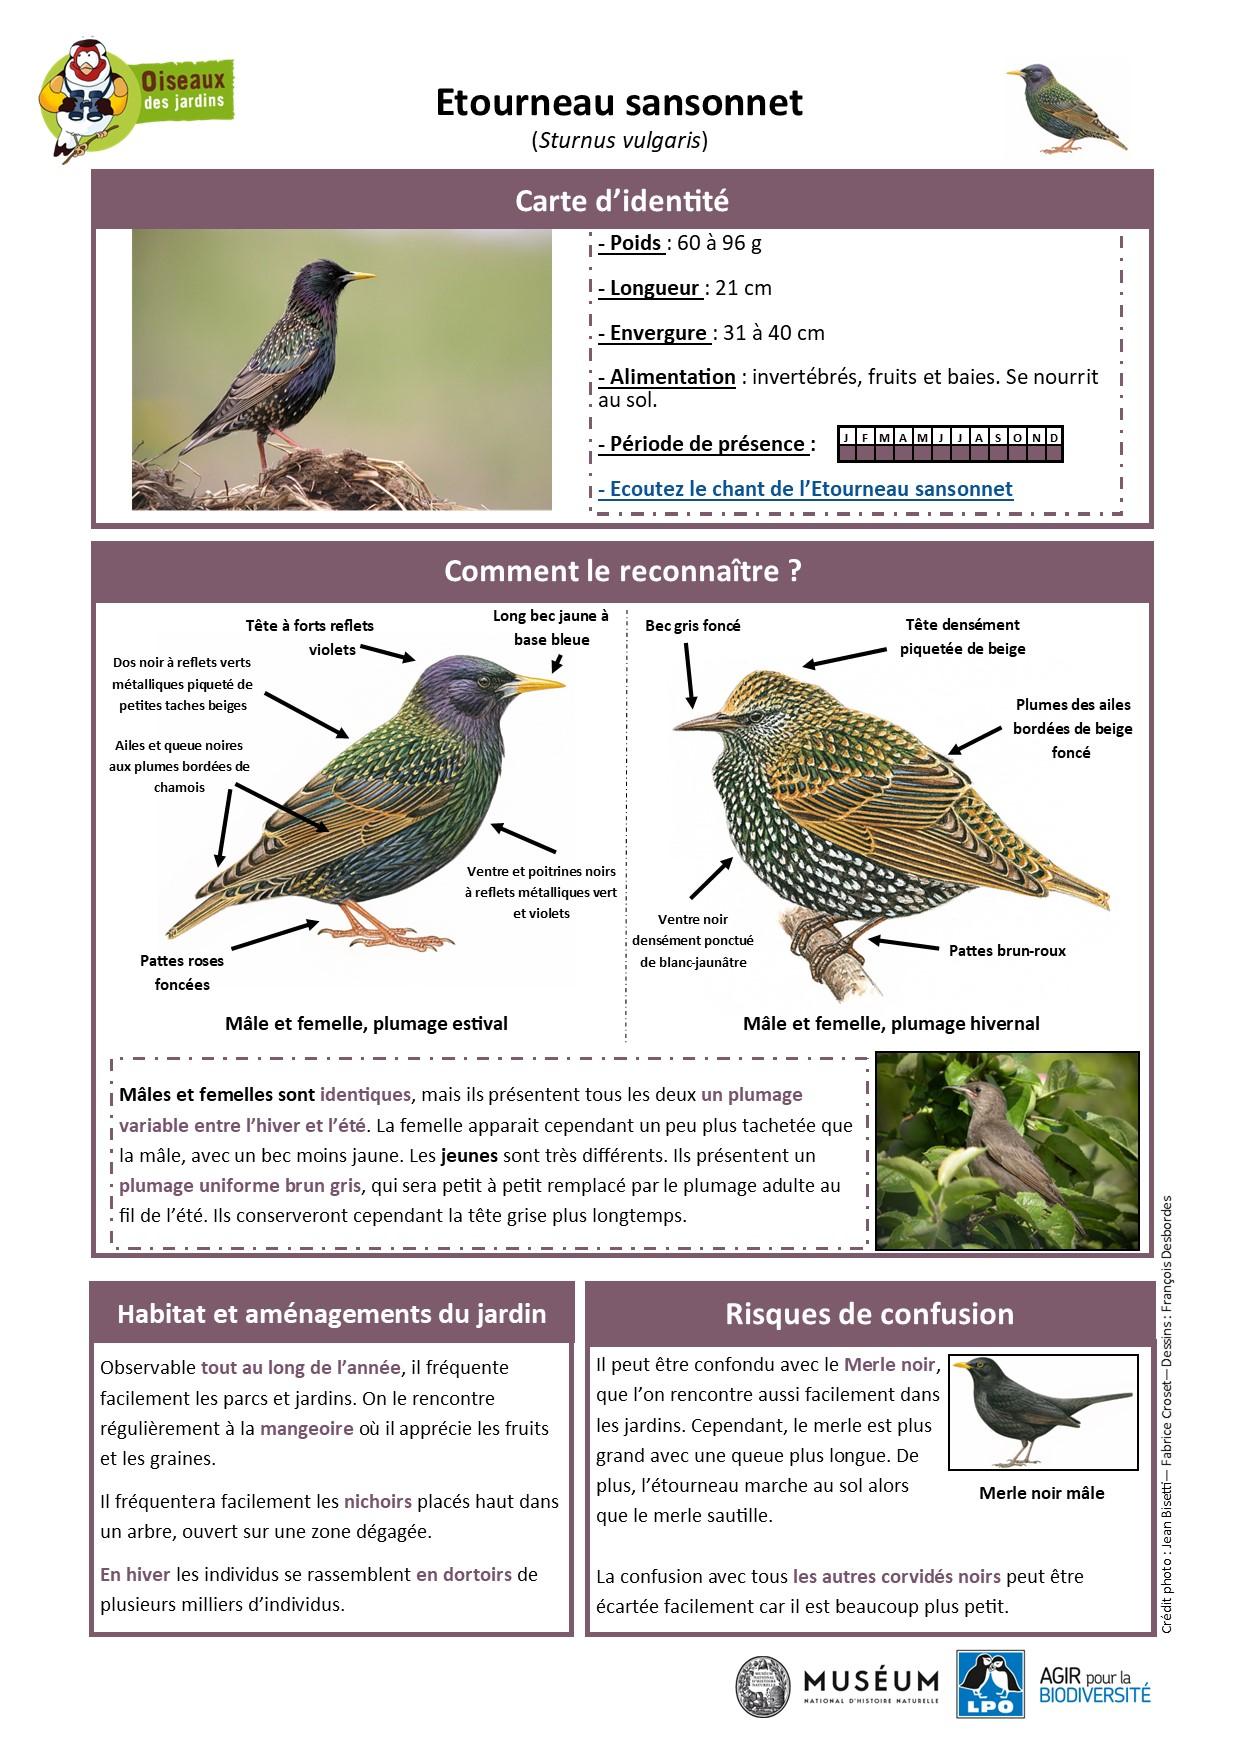 https://cdnfiles2.biolovision.net/www.oiseauxdesjardins.fr/userfiles/Fichesespces/FicheespceETScorrige.jpg